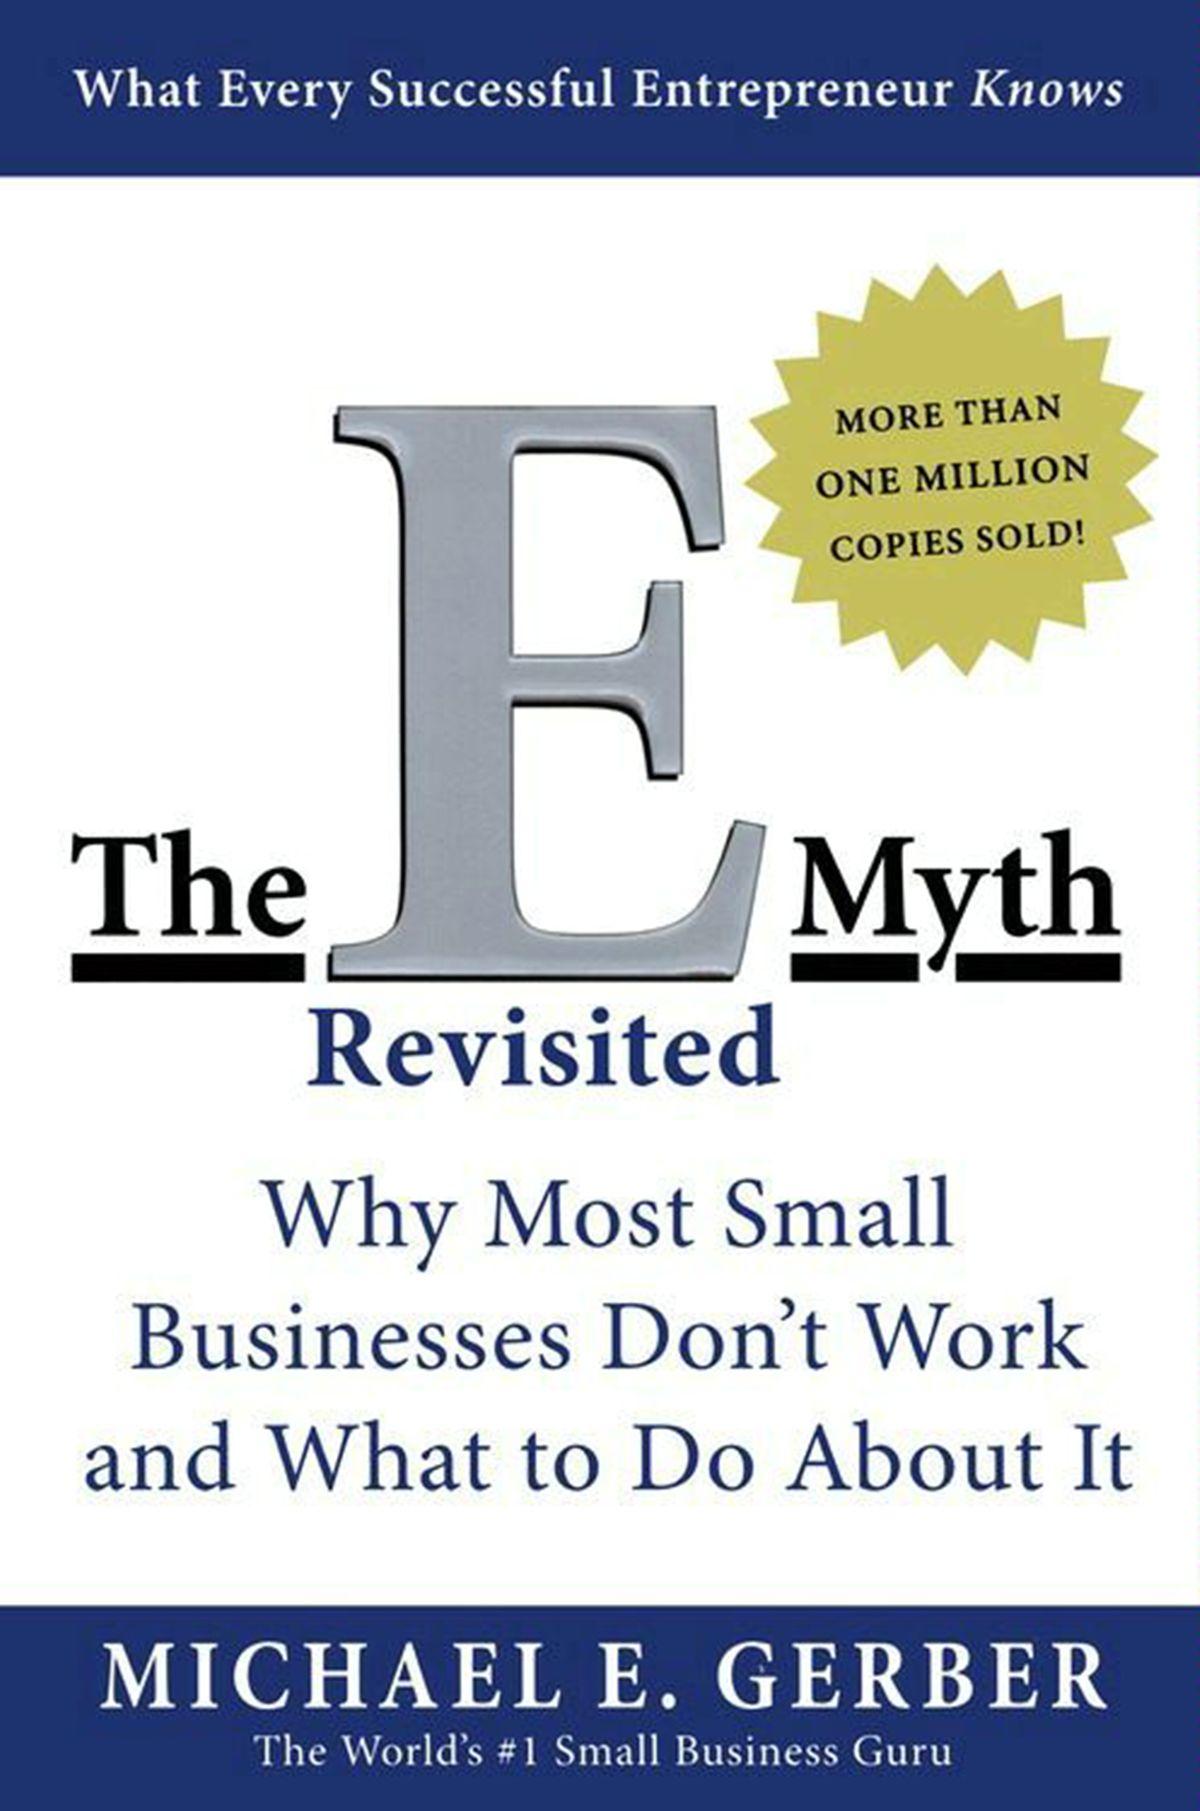 the-e-myth-revisited.jpg